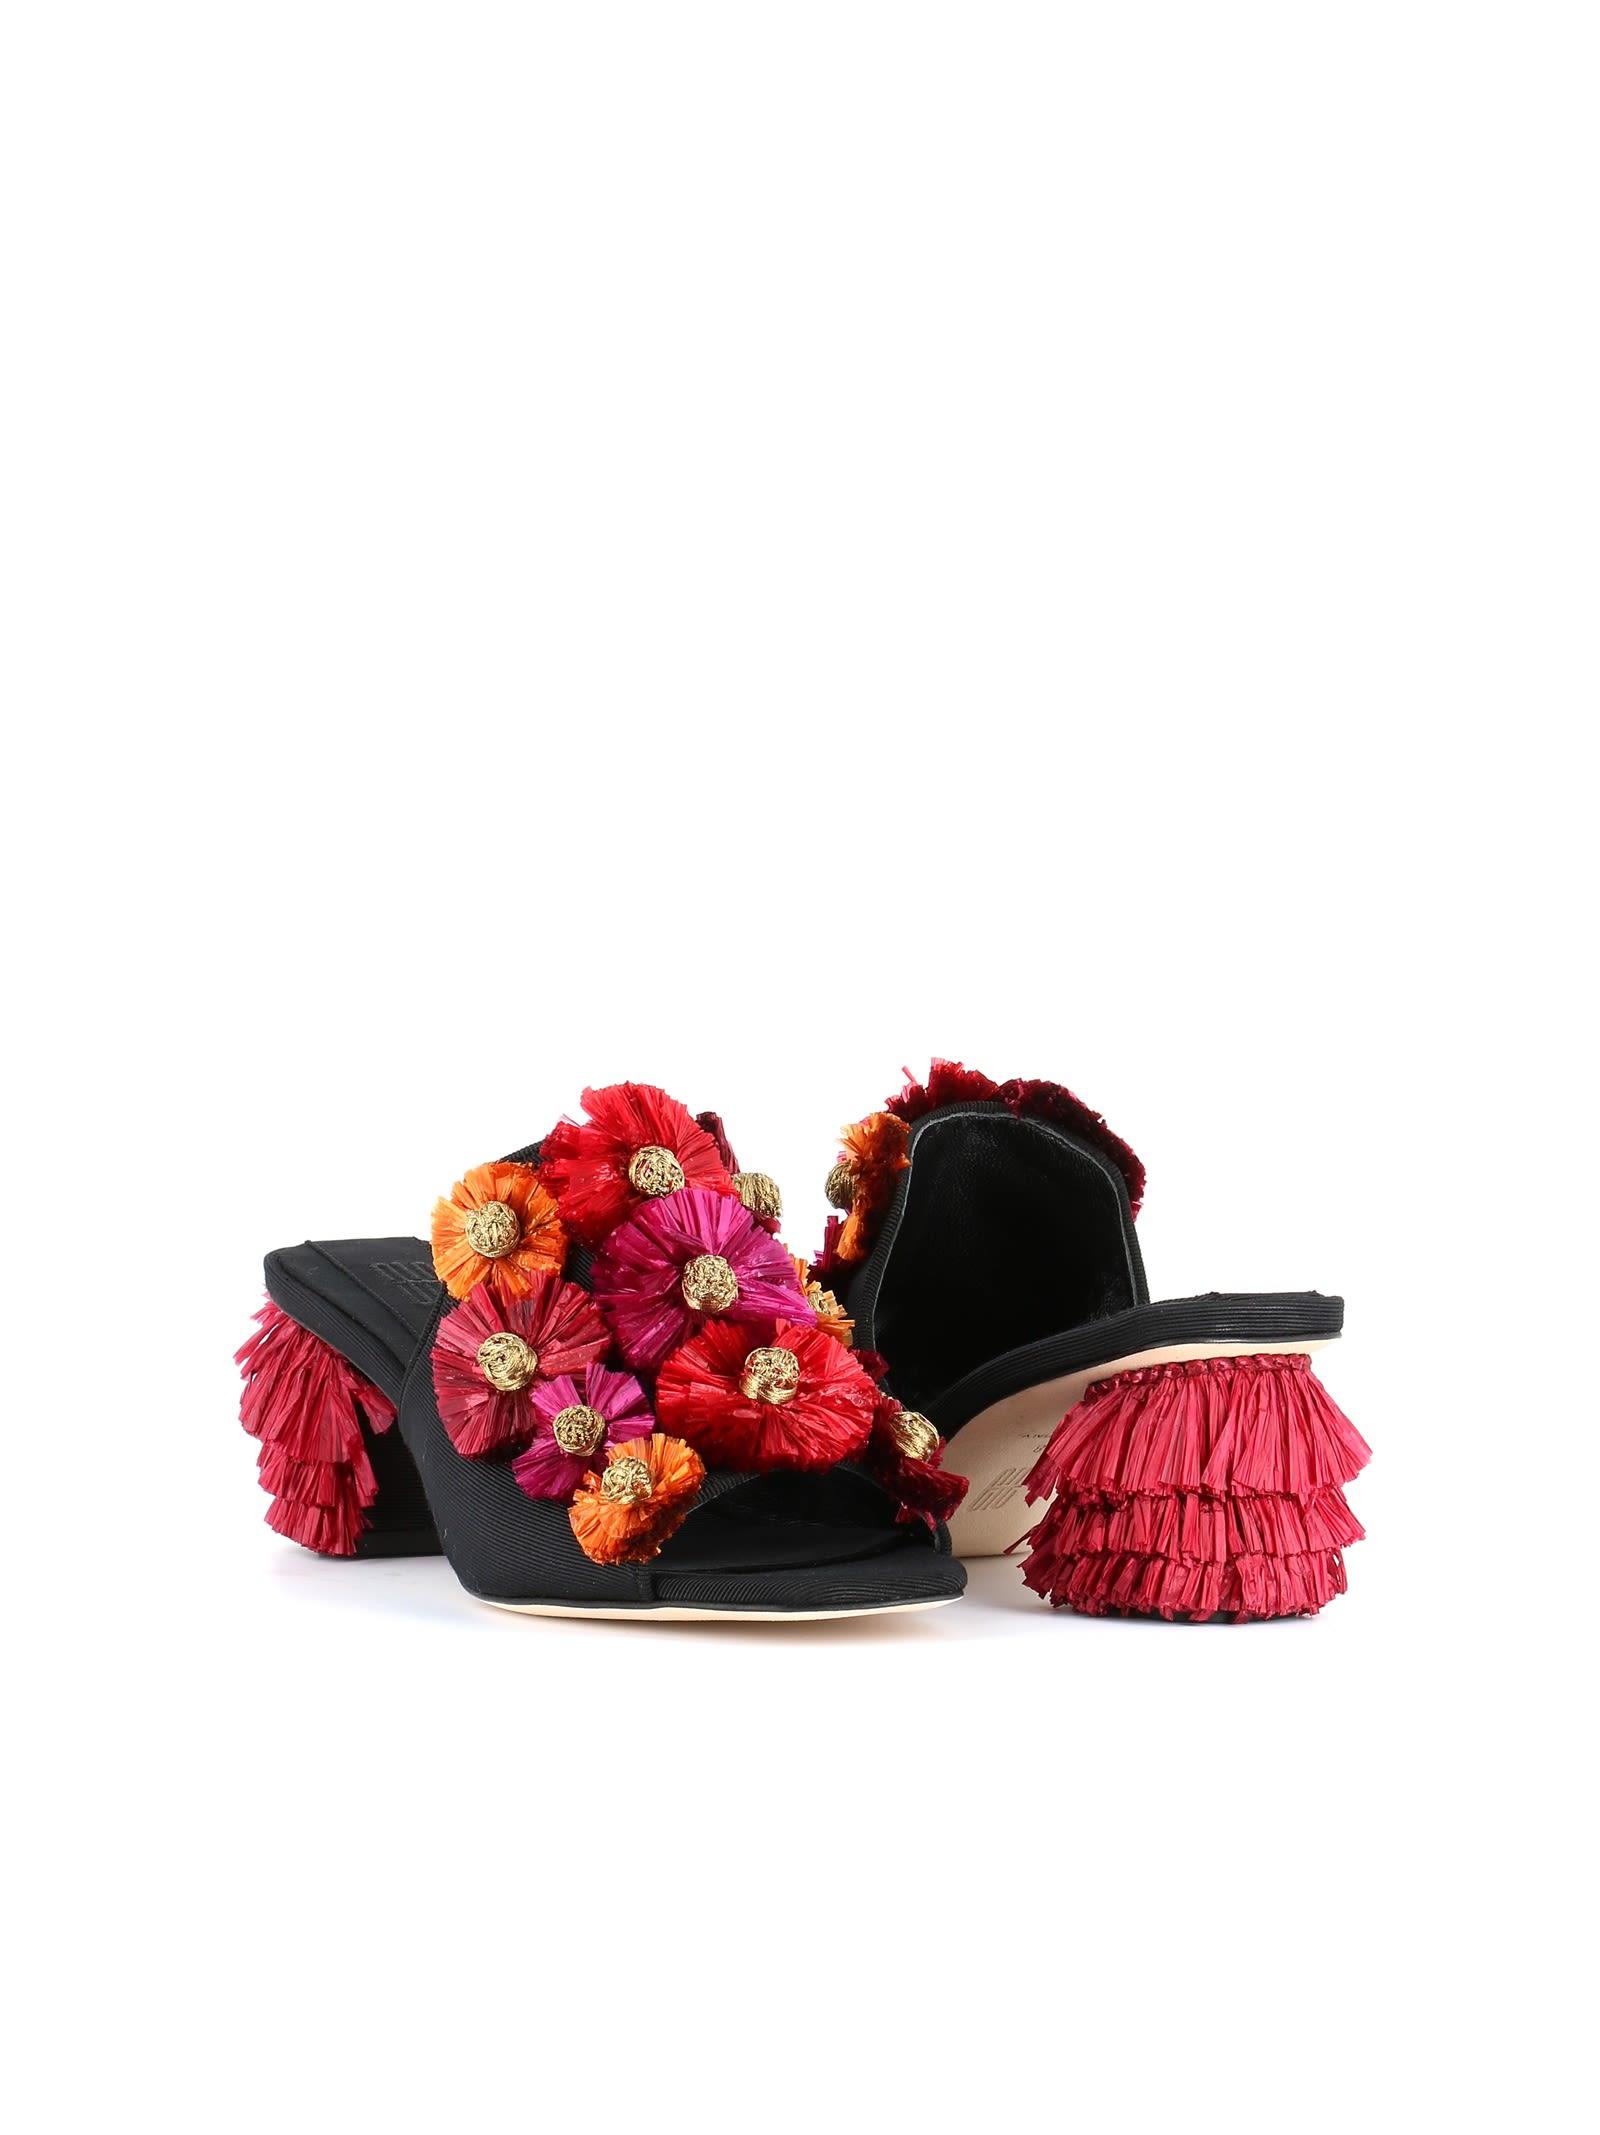 Sanayi 313 Fiora 112641 Sandals Tq1BtK6PYY